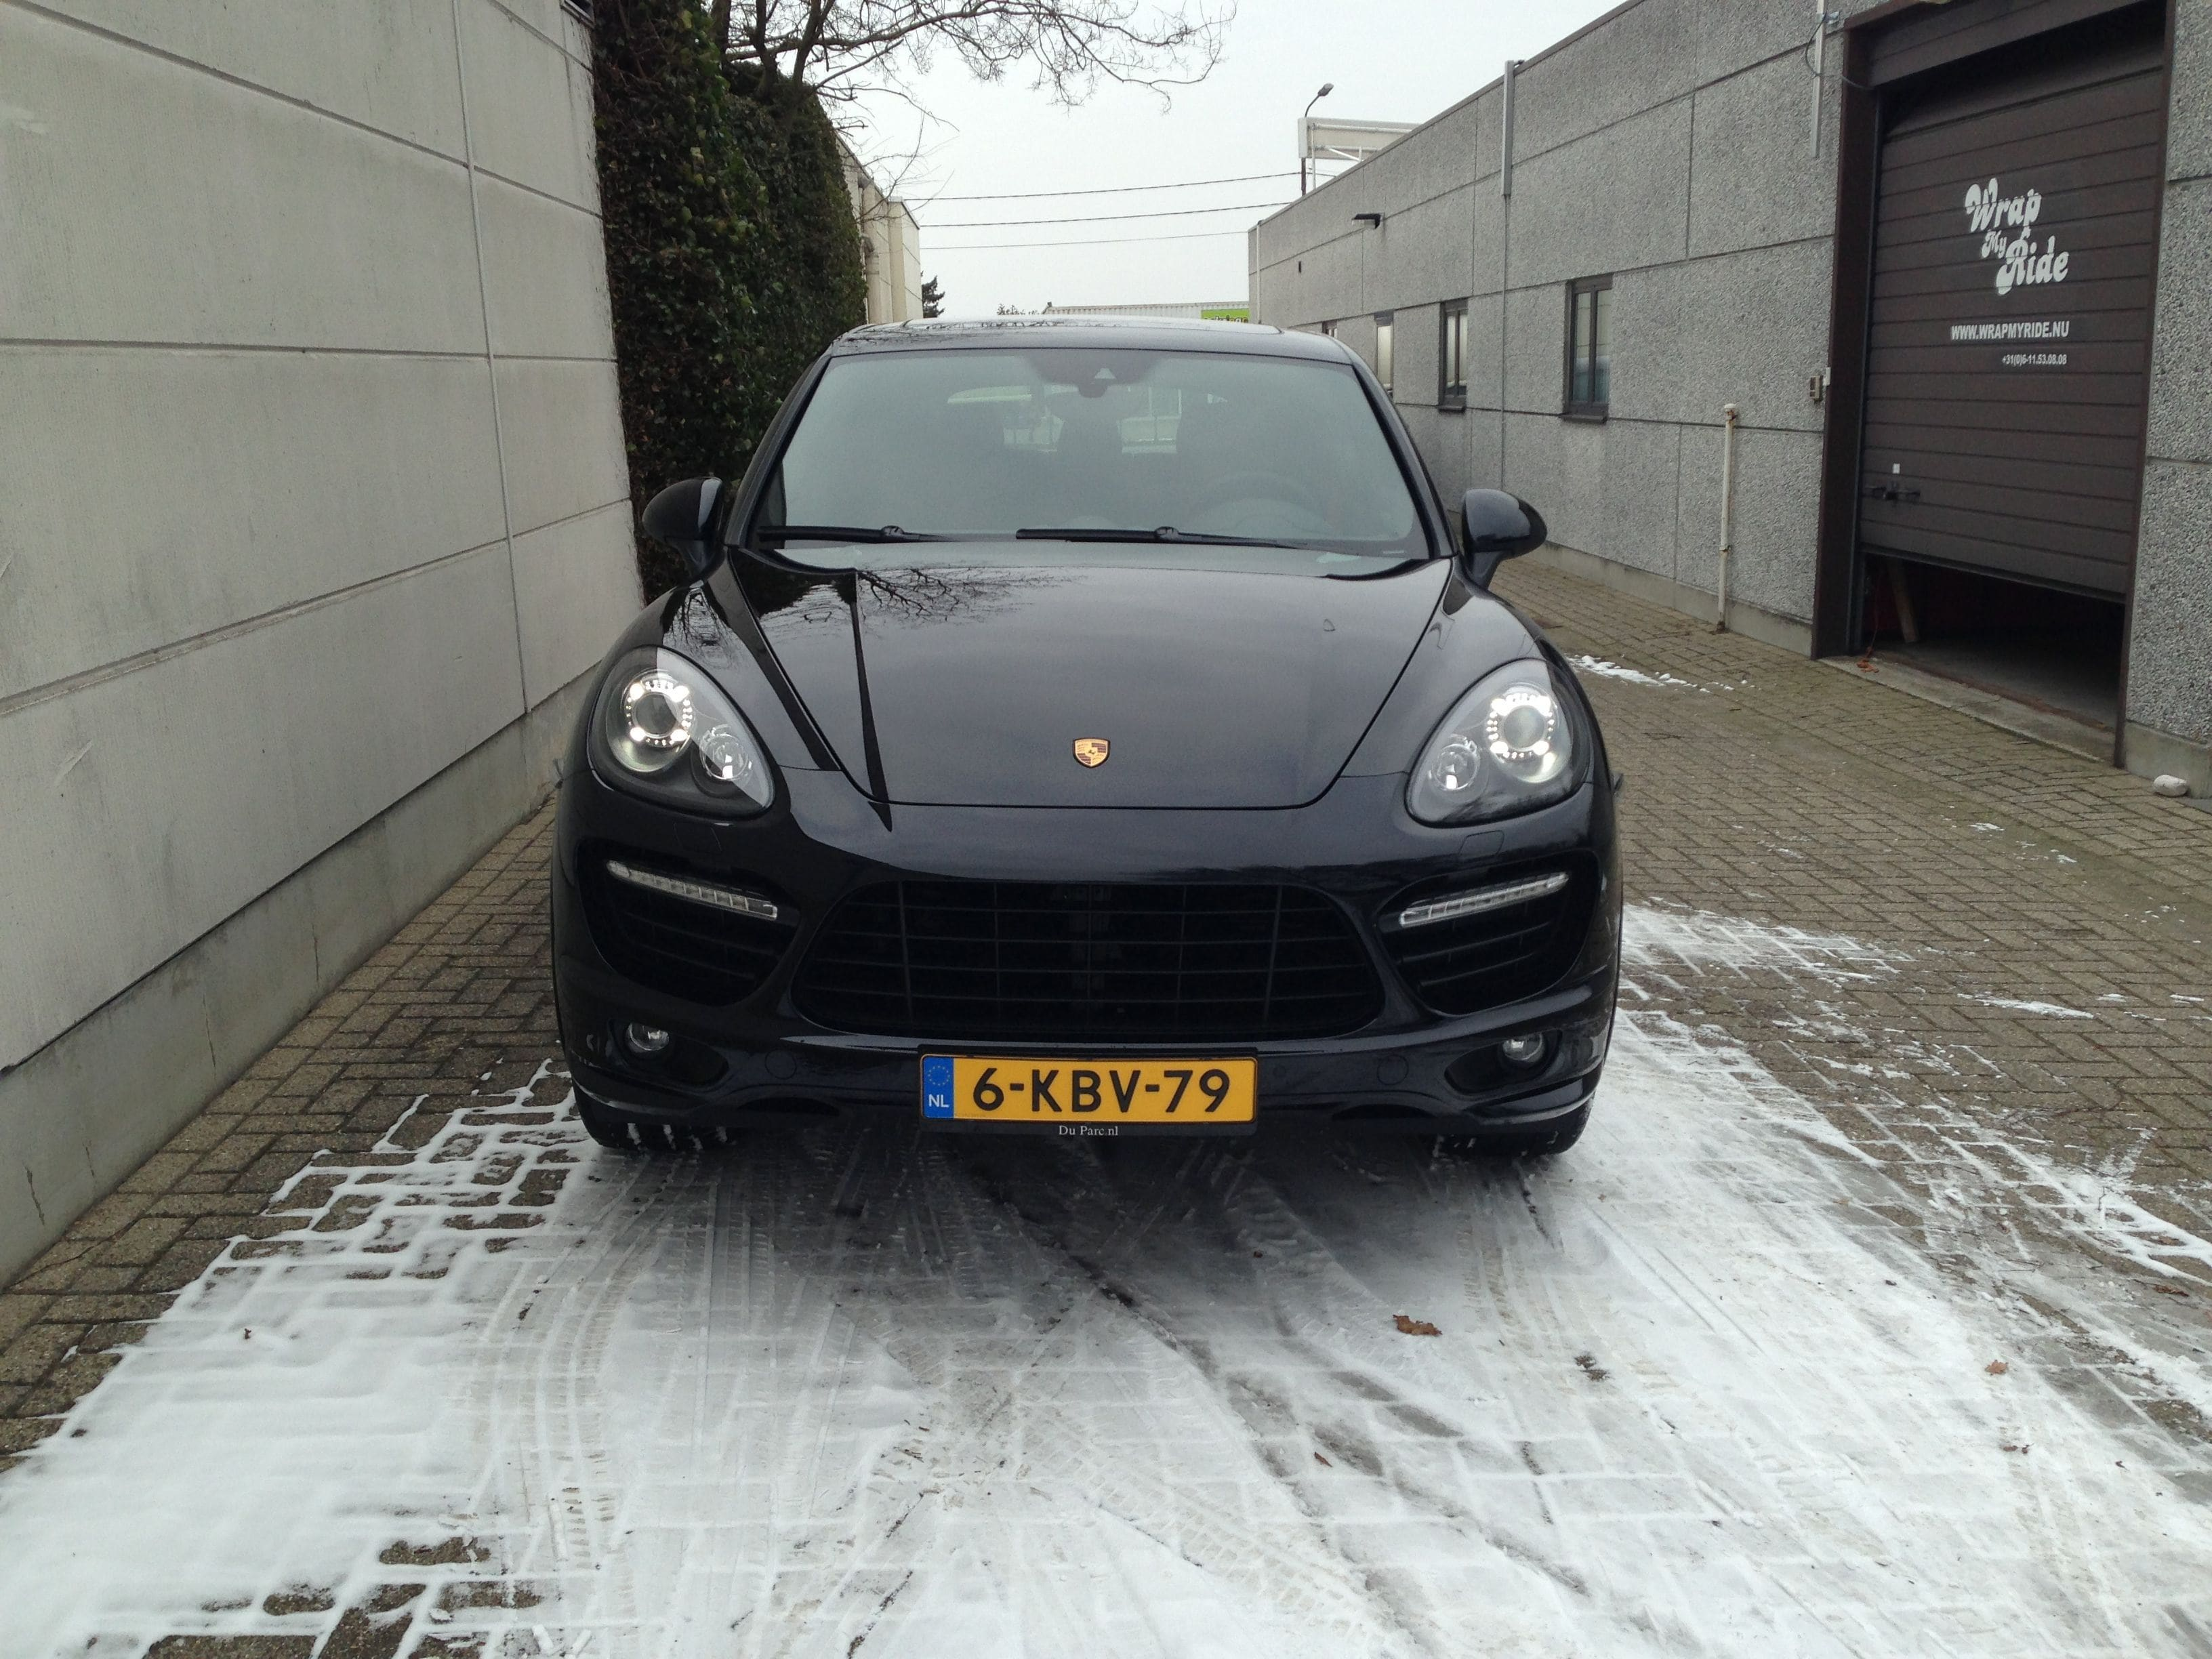 Porsche Cayenne GTS met Gunpowder Wrap, Carwrapping door Wrapmyride.nu Foto-nr:6759, ©2021